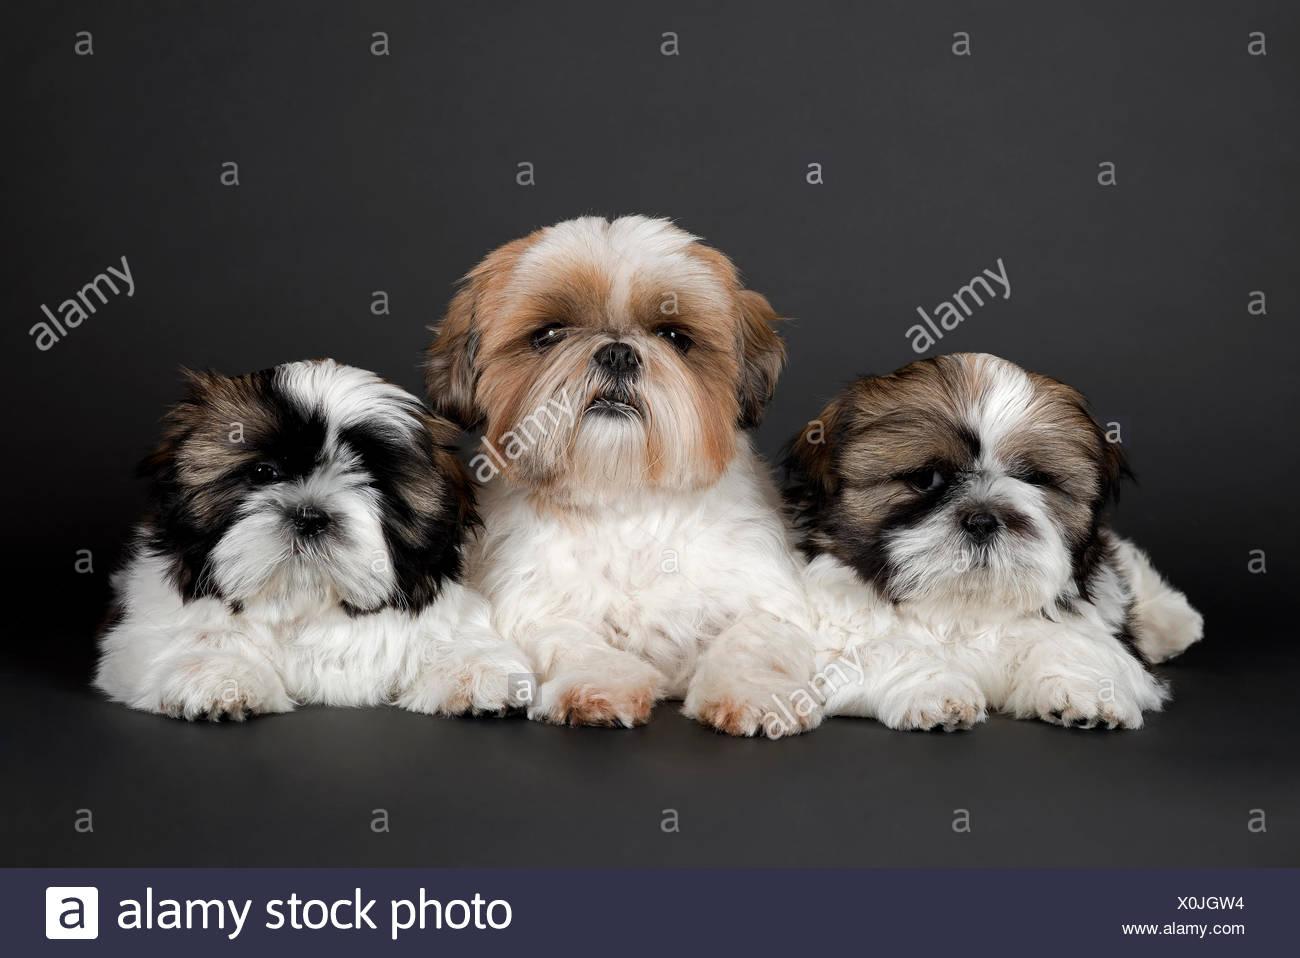 Shih Tzu Puppies 10 Weeks Colour Gold White Stock Photo Alamy